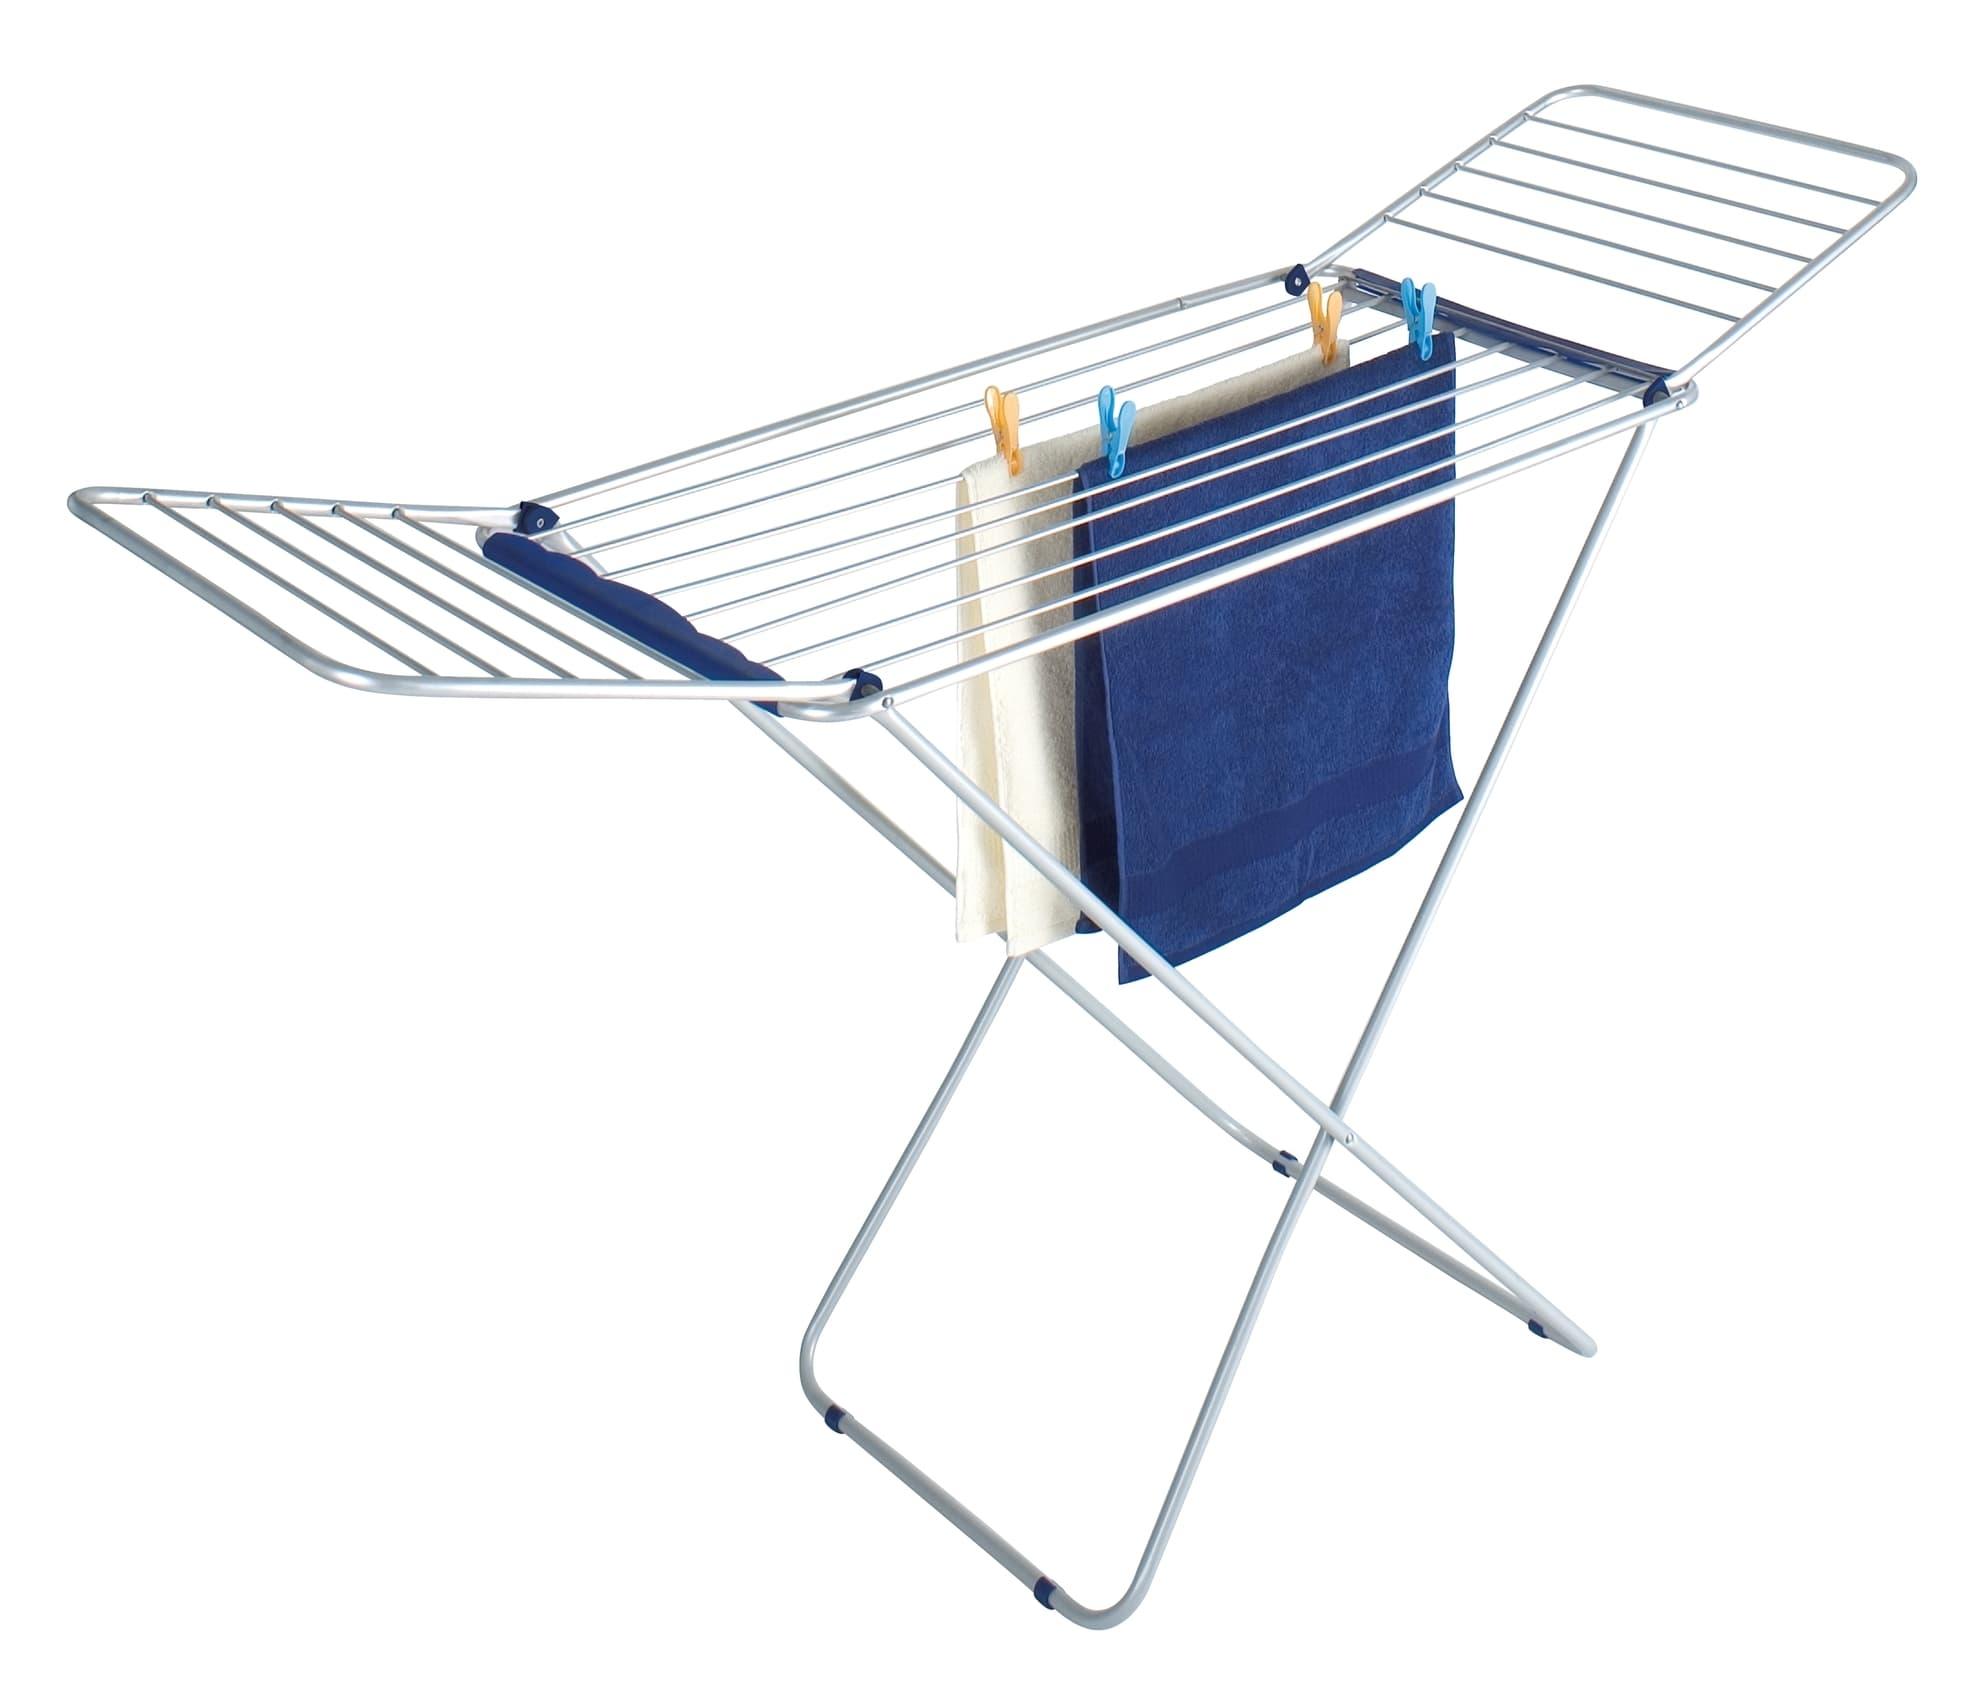 Uscator rufe pliabil, cadru metalic, Wings Gri Deschis, 16 m imagine